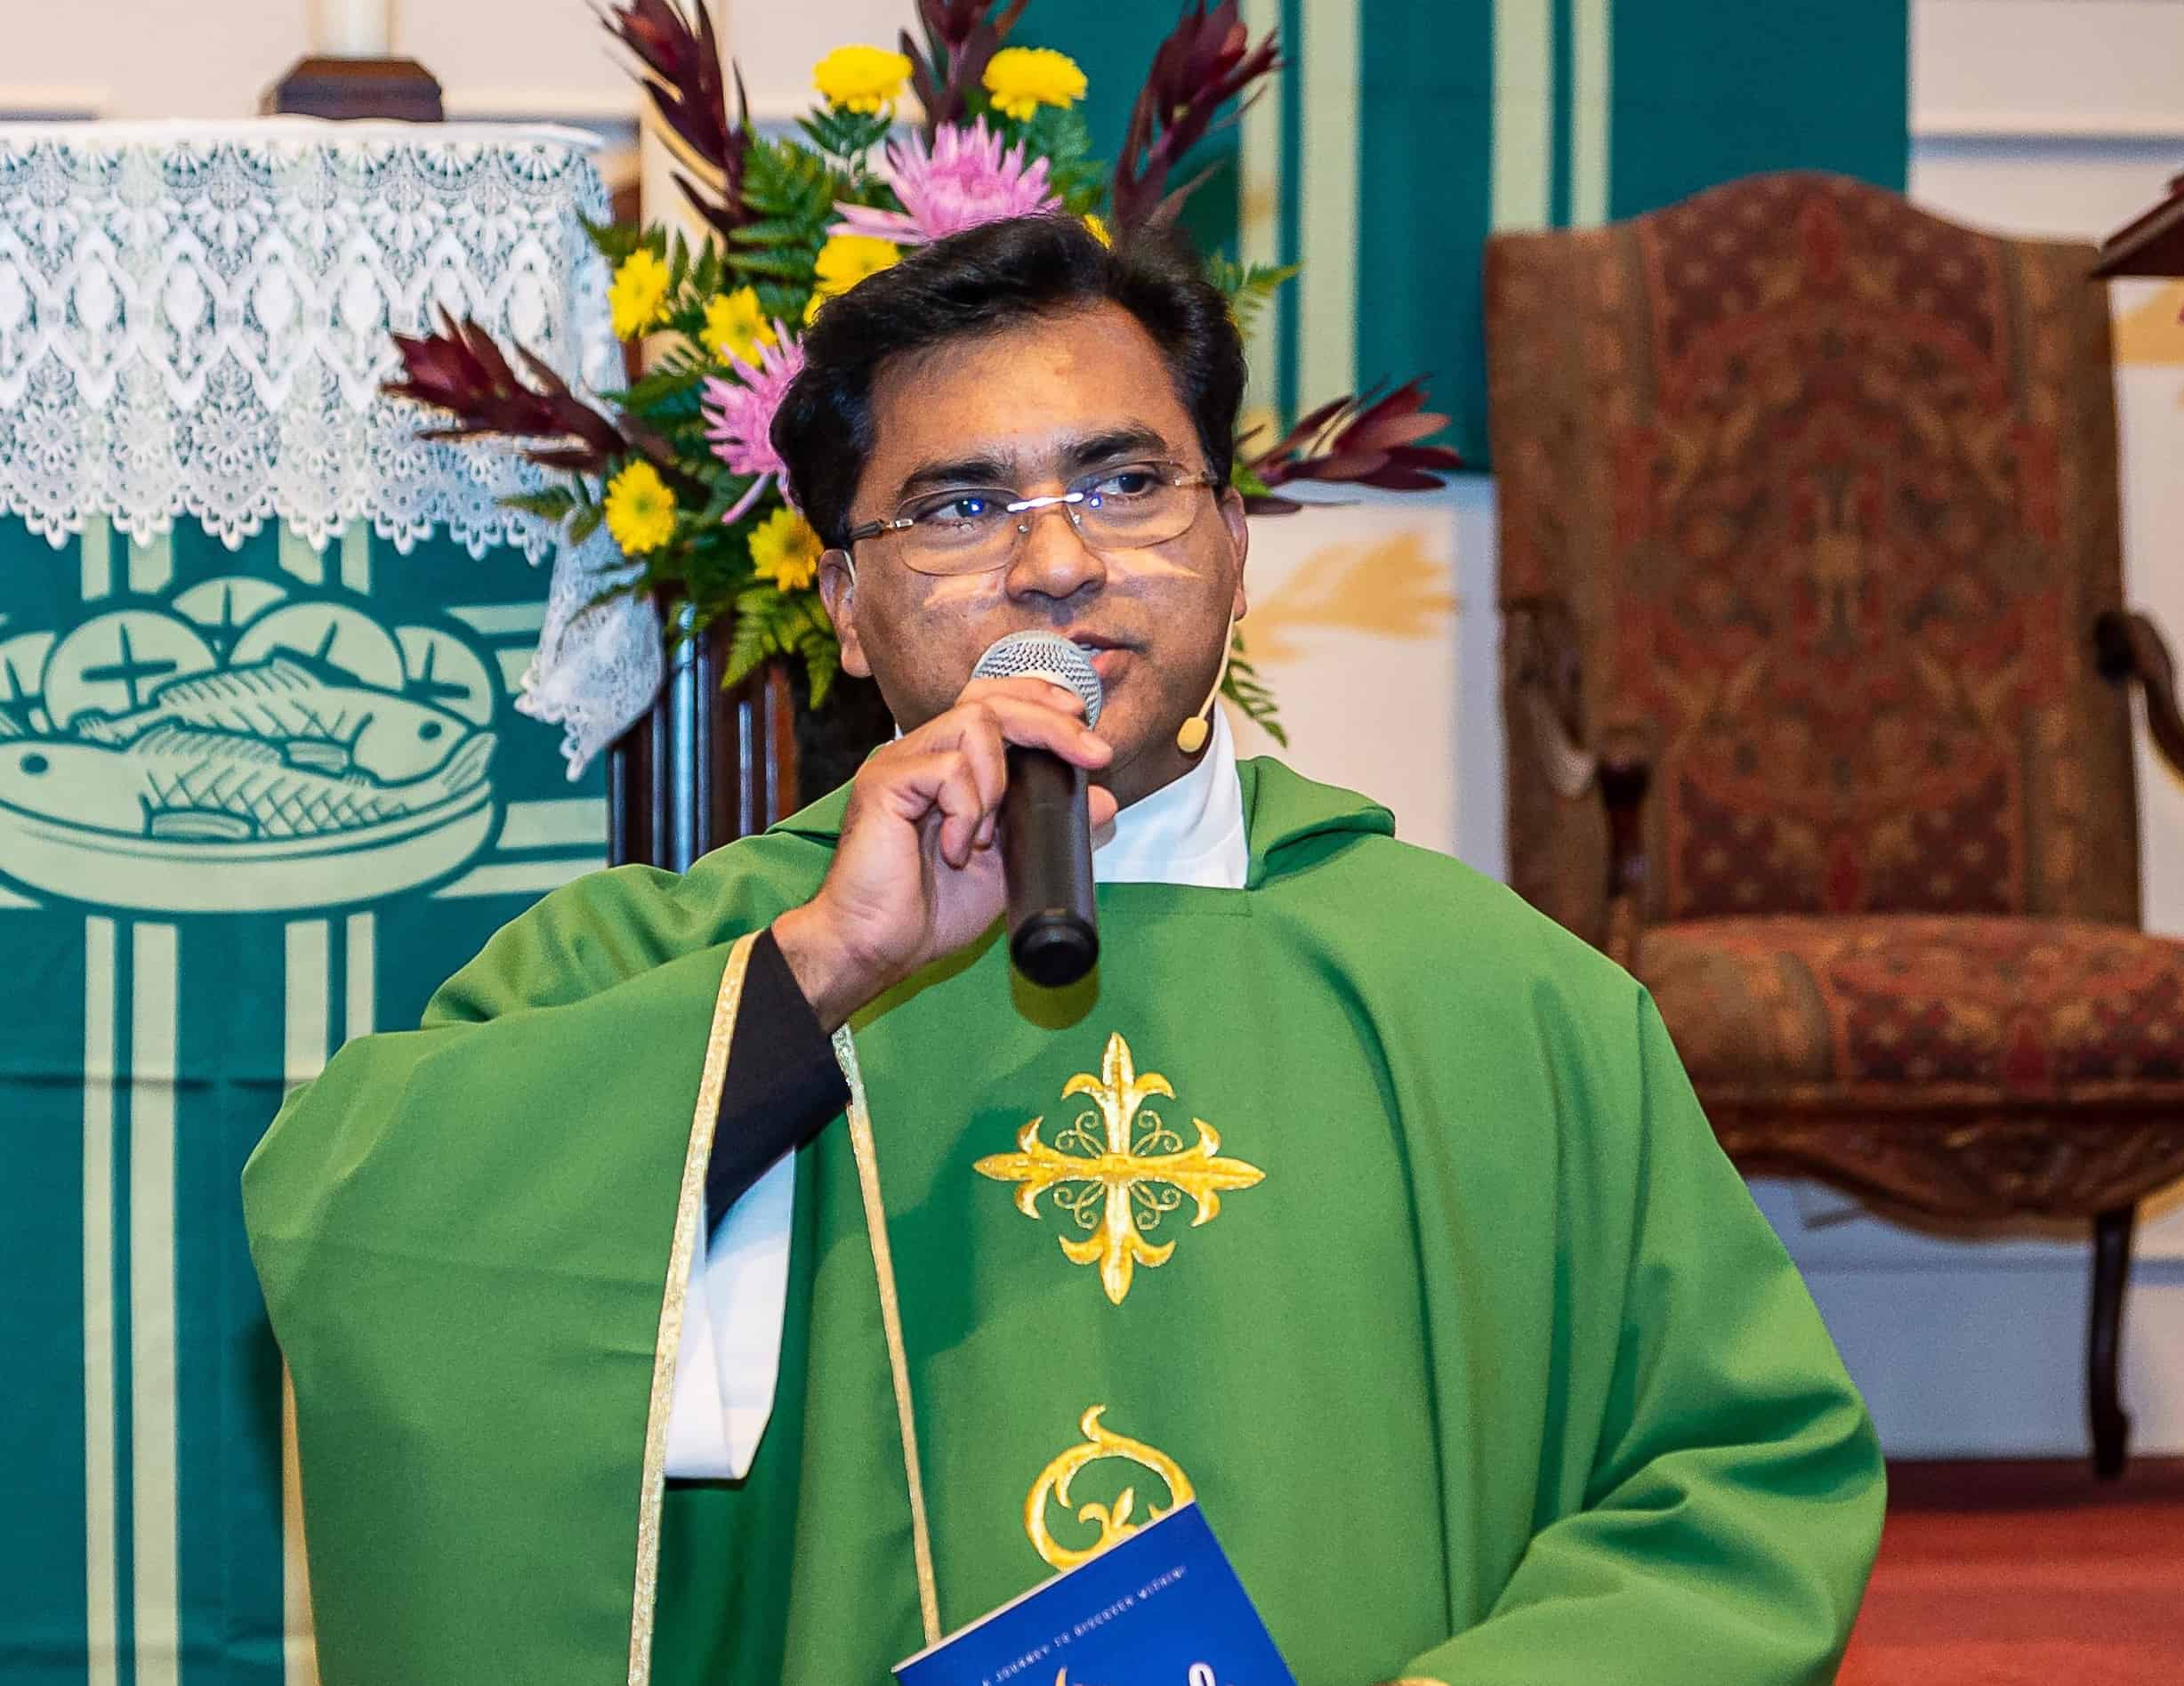 Former pastor in Diocese of Nashville publishes new book